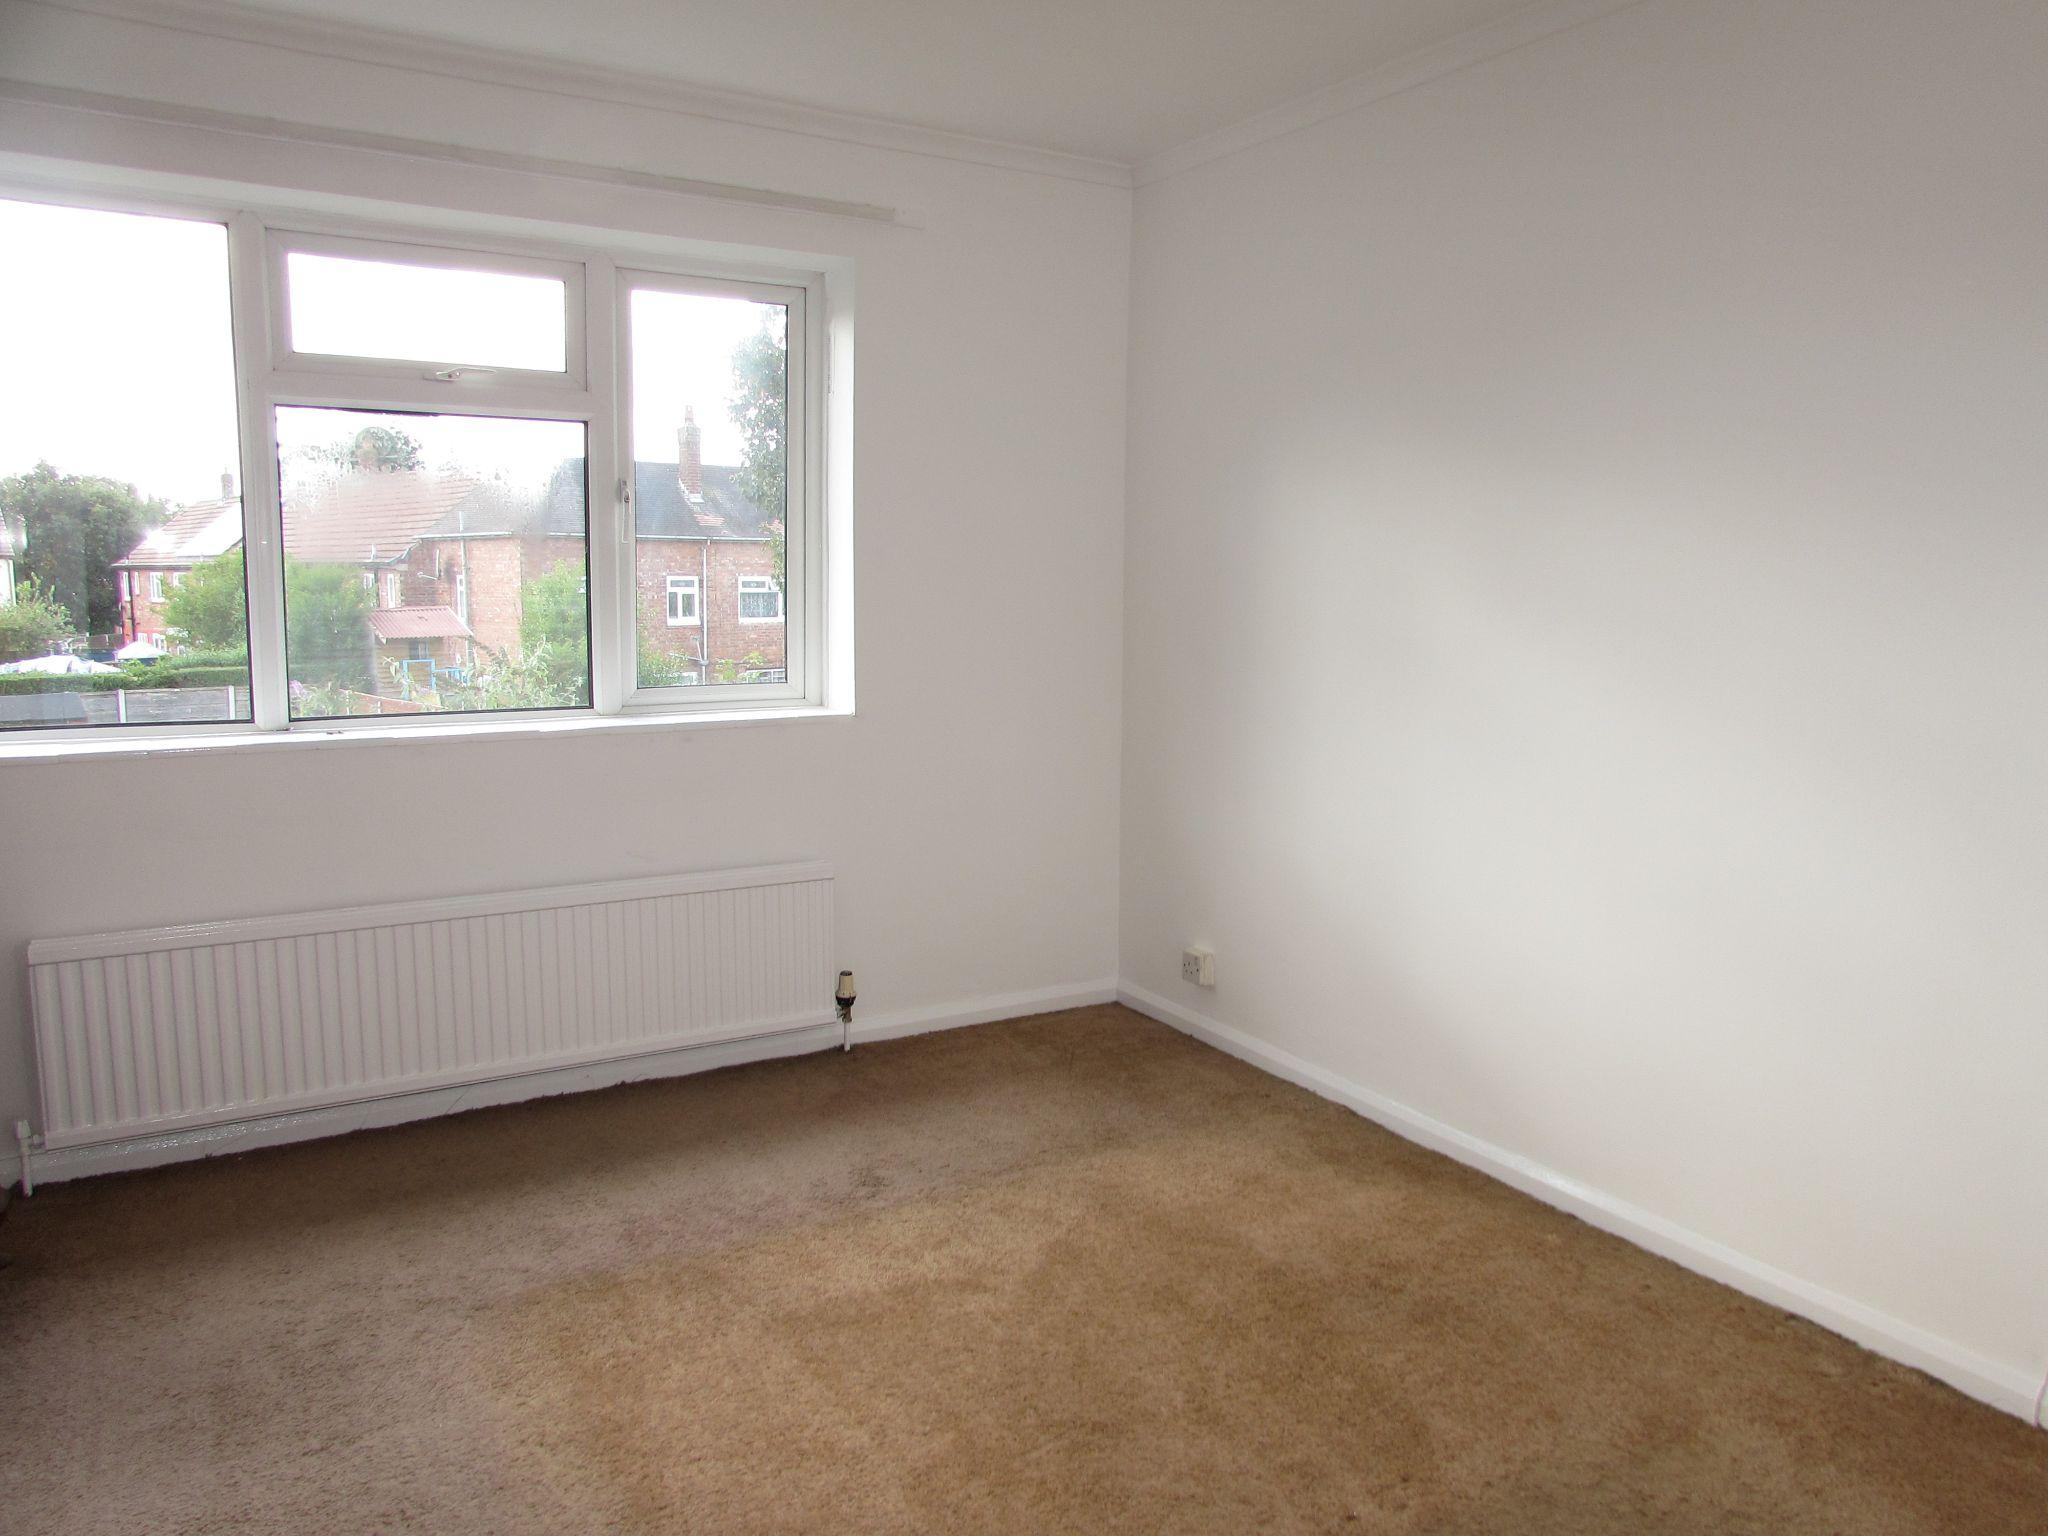 4 Bedroom Semi-detached House For Sale - BEDROOM 1